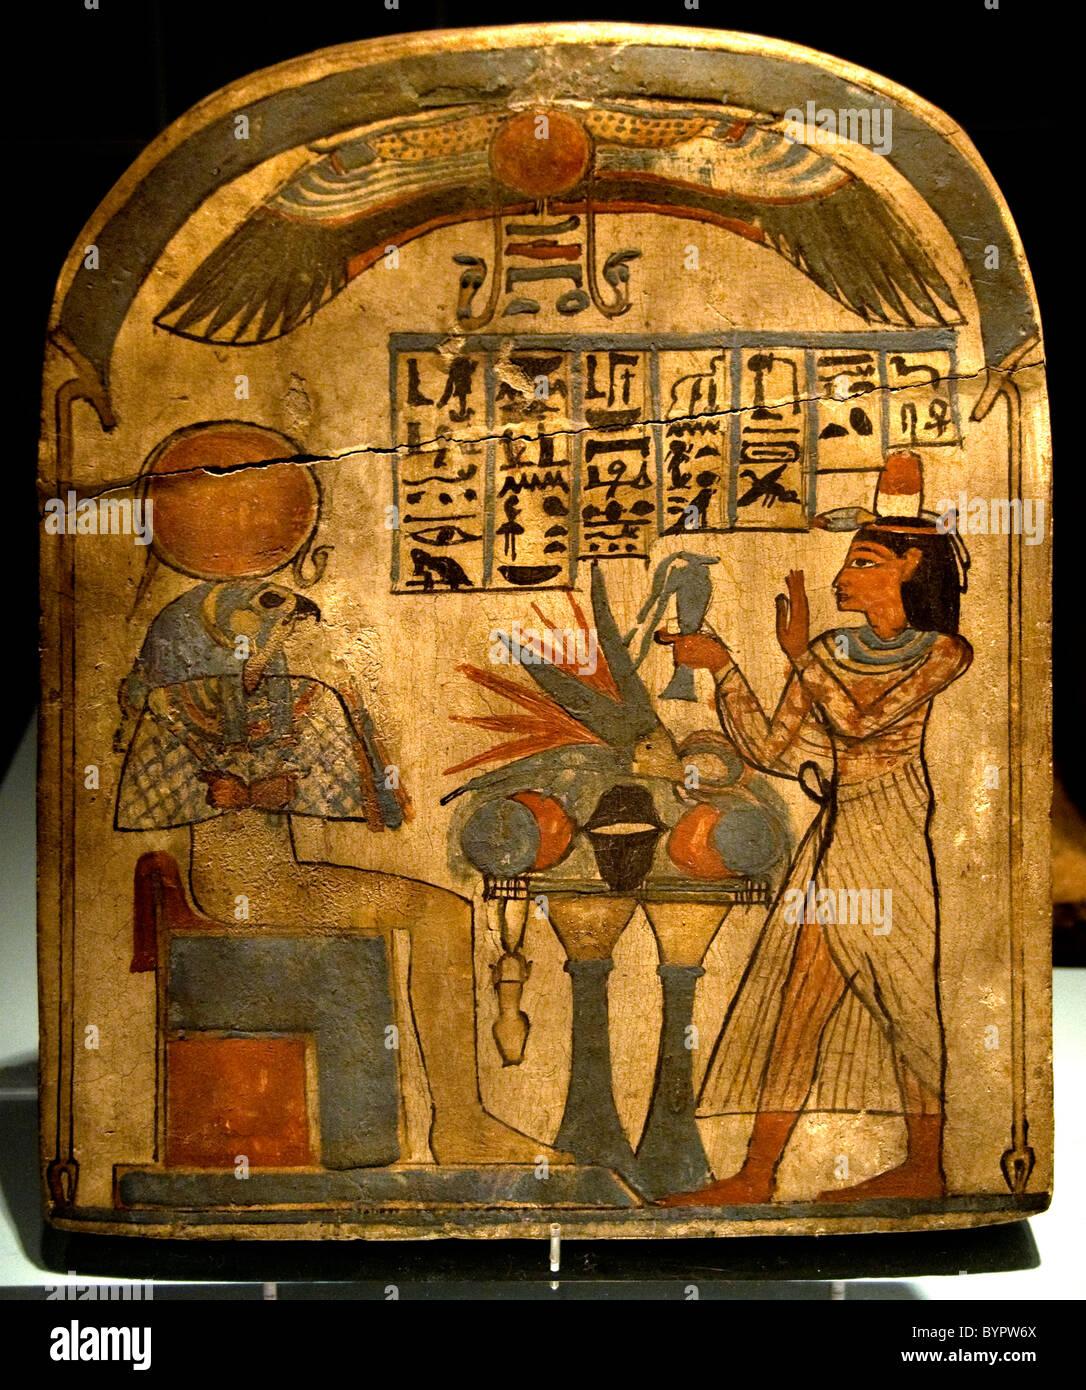 Museum Ägypten antike Pharao Gott Göttin Kultur Stockbild